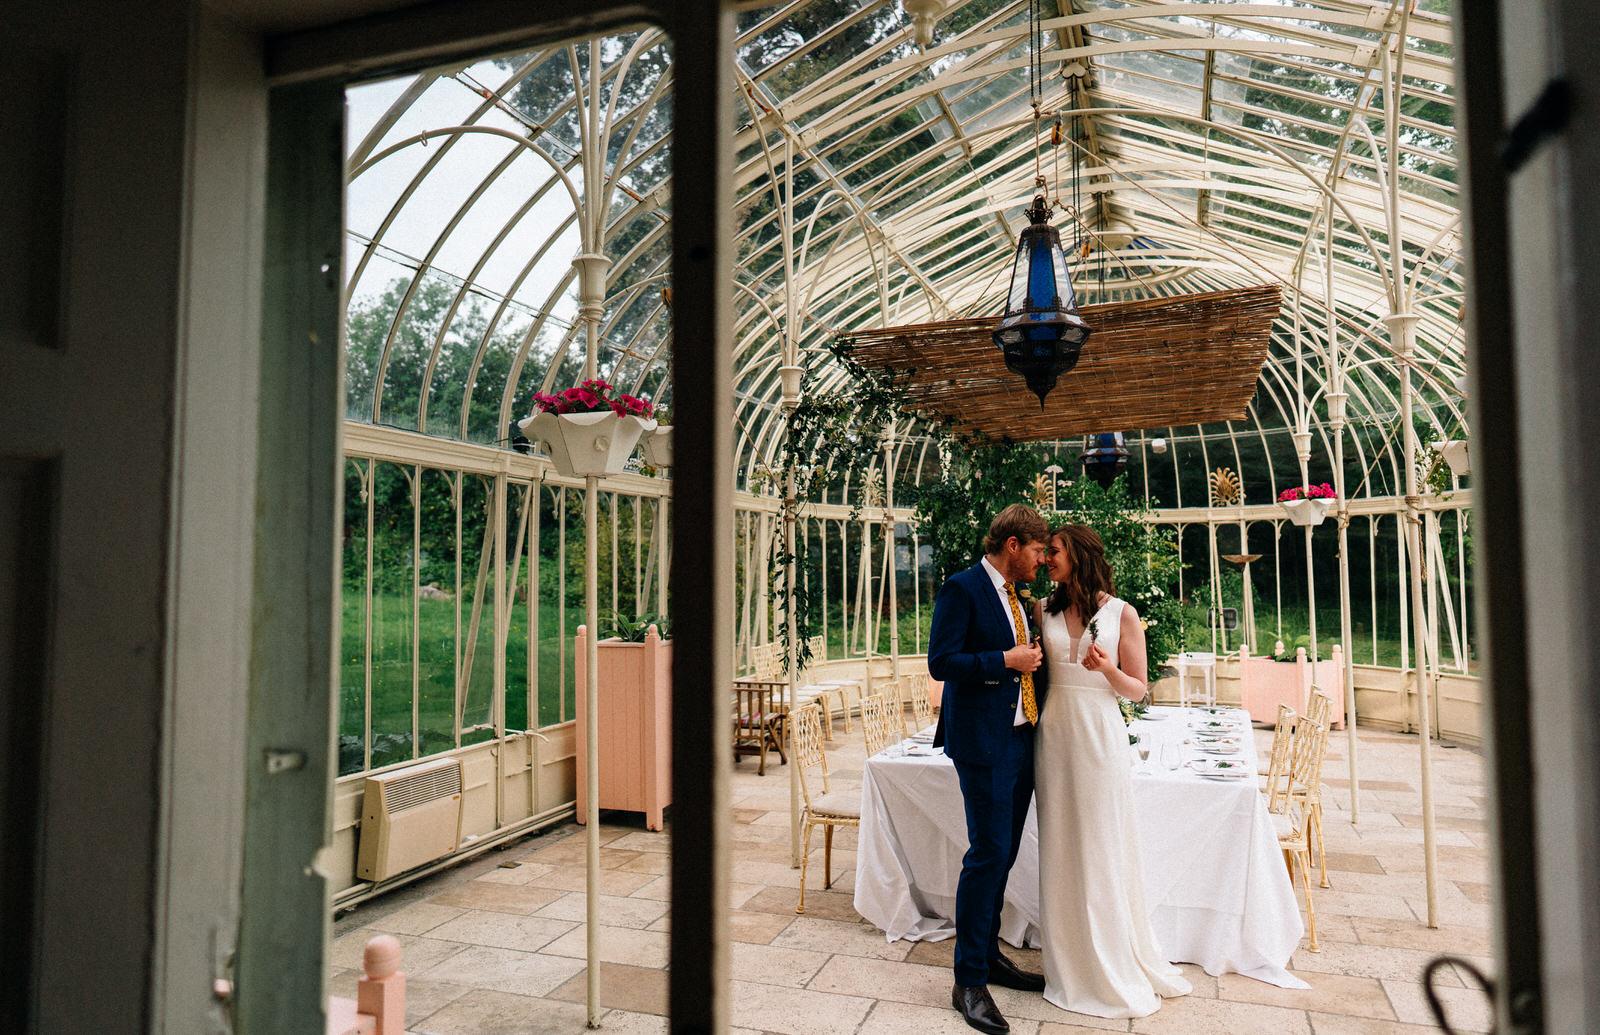 Cork documentary wedding photography 0145 144